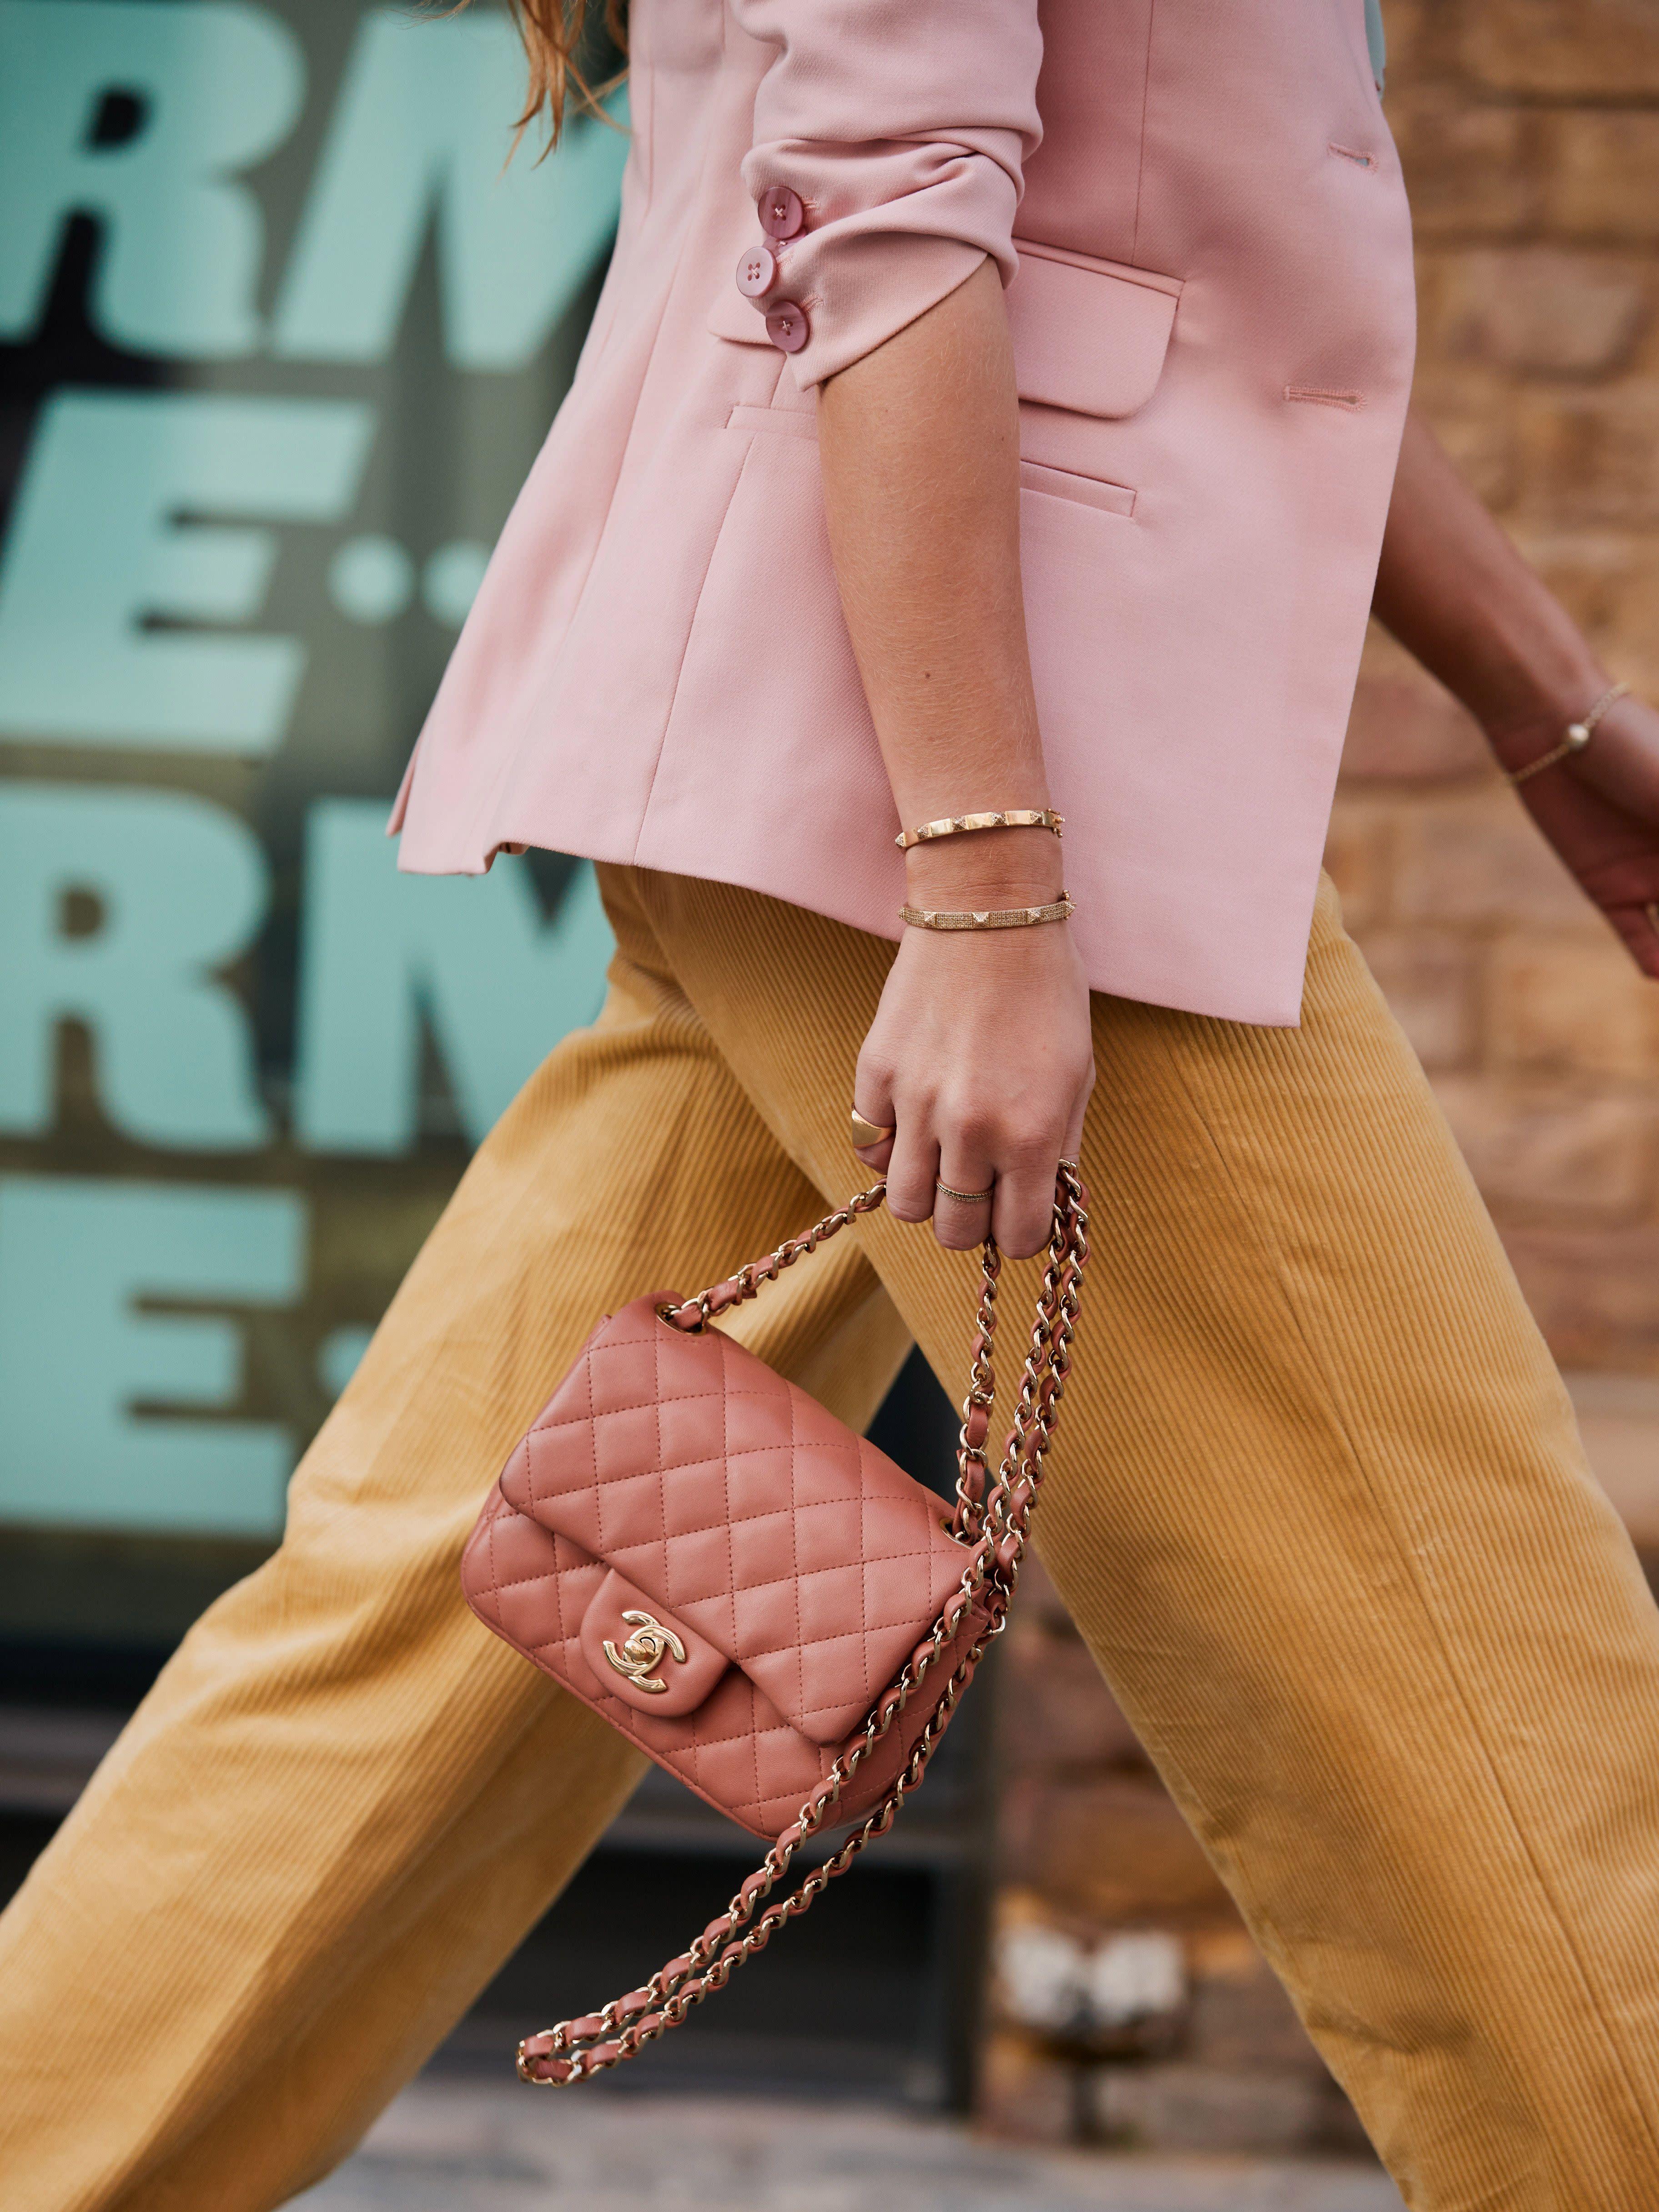 151ed4d85d The Handbag Trend That Always Looks So Expensive